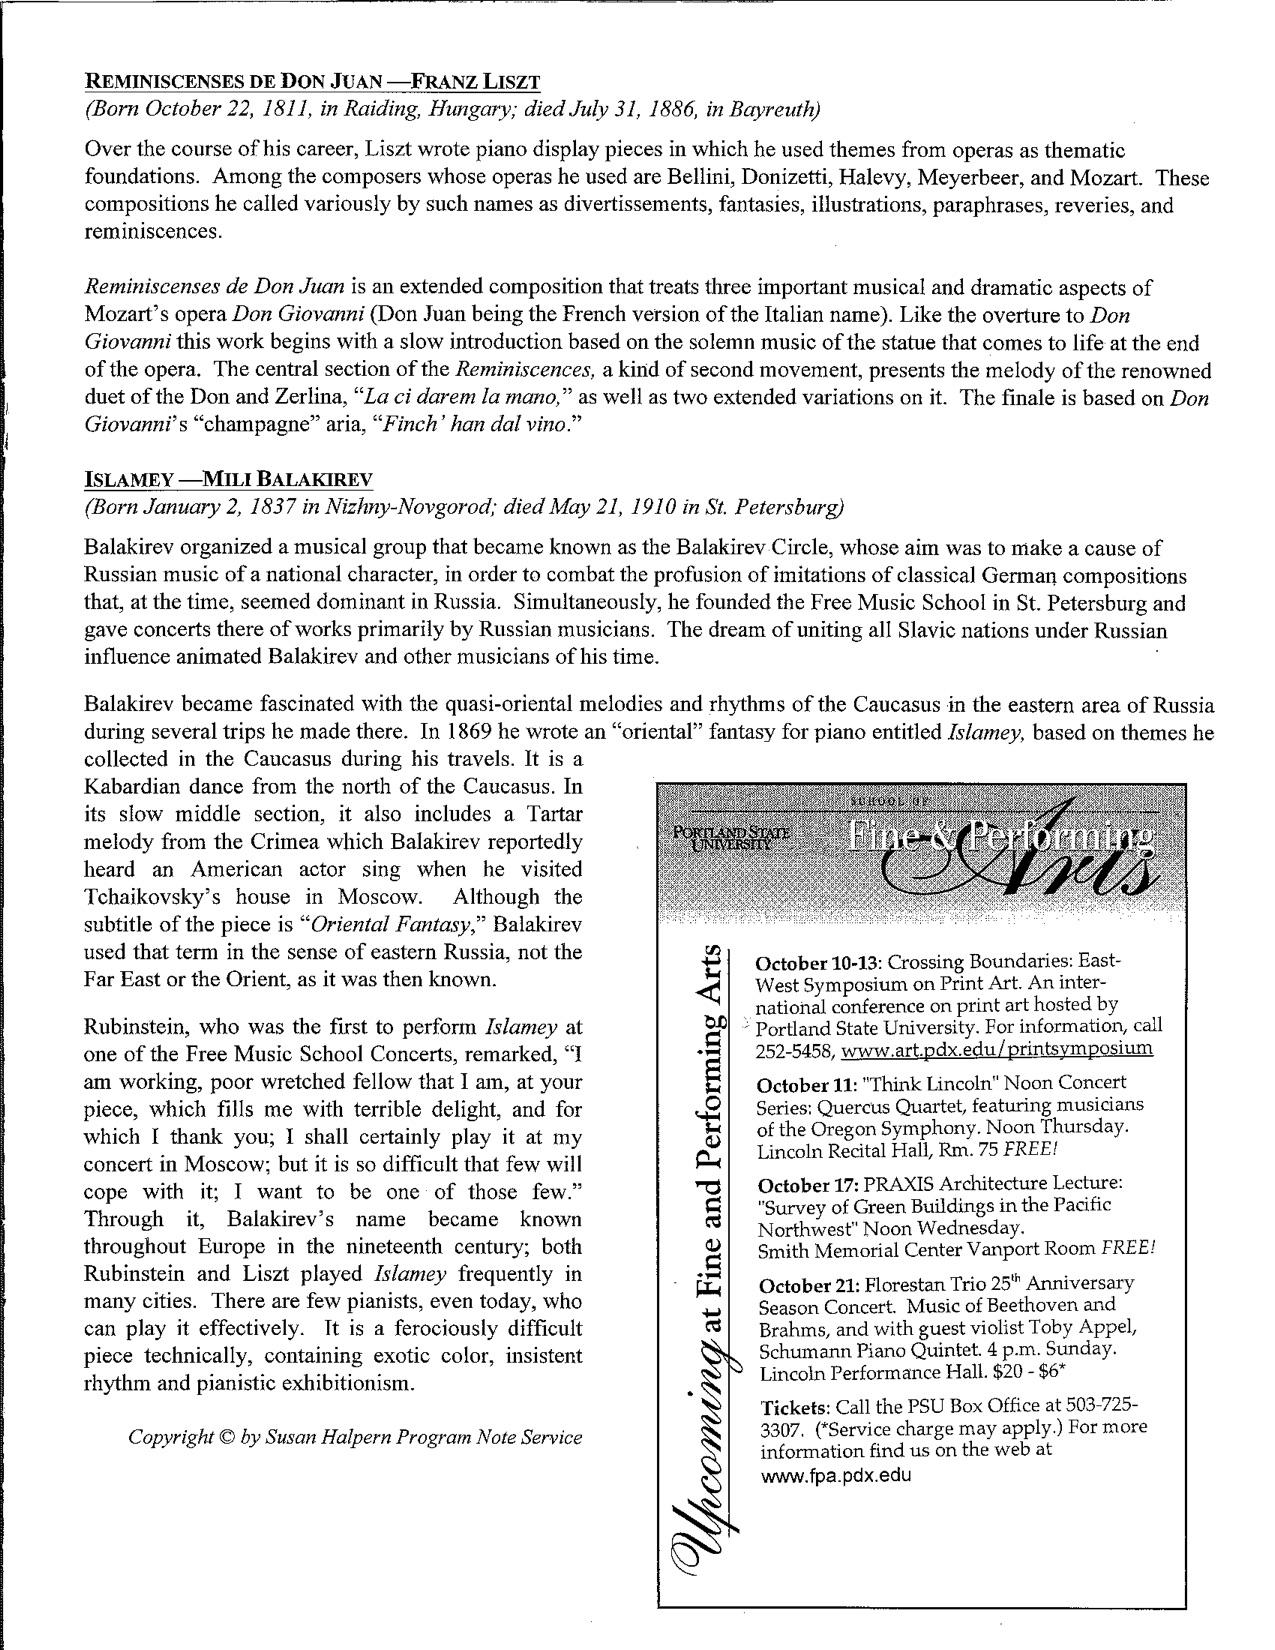 IoudenitchKern01-02_Program11.jpg